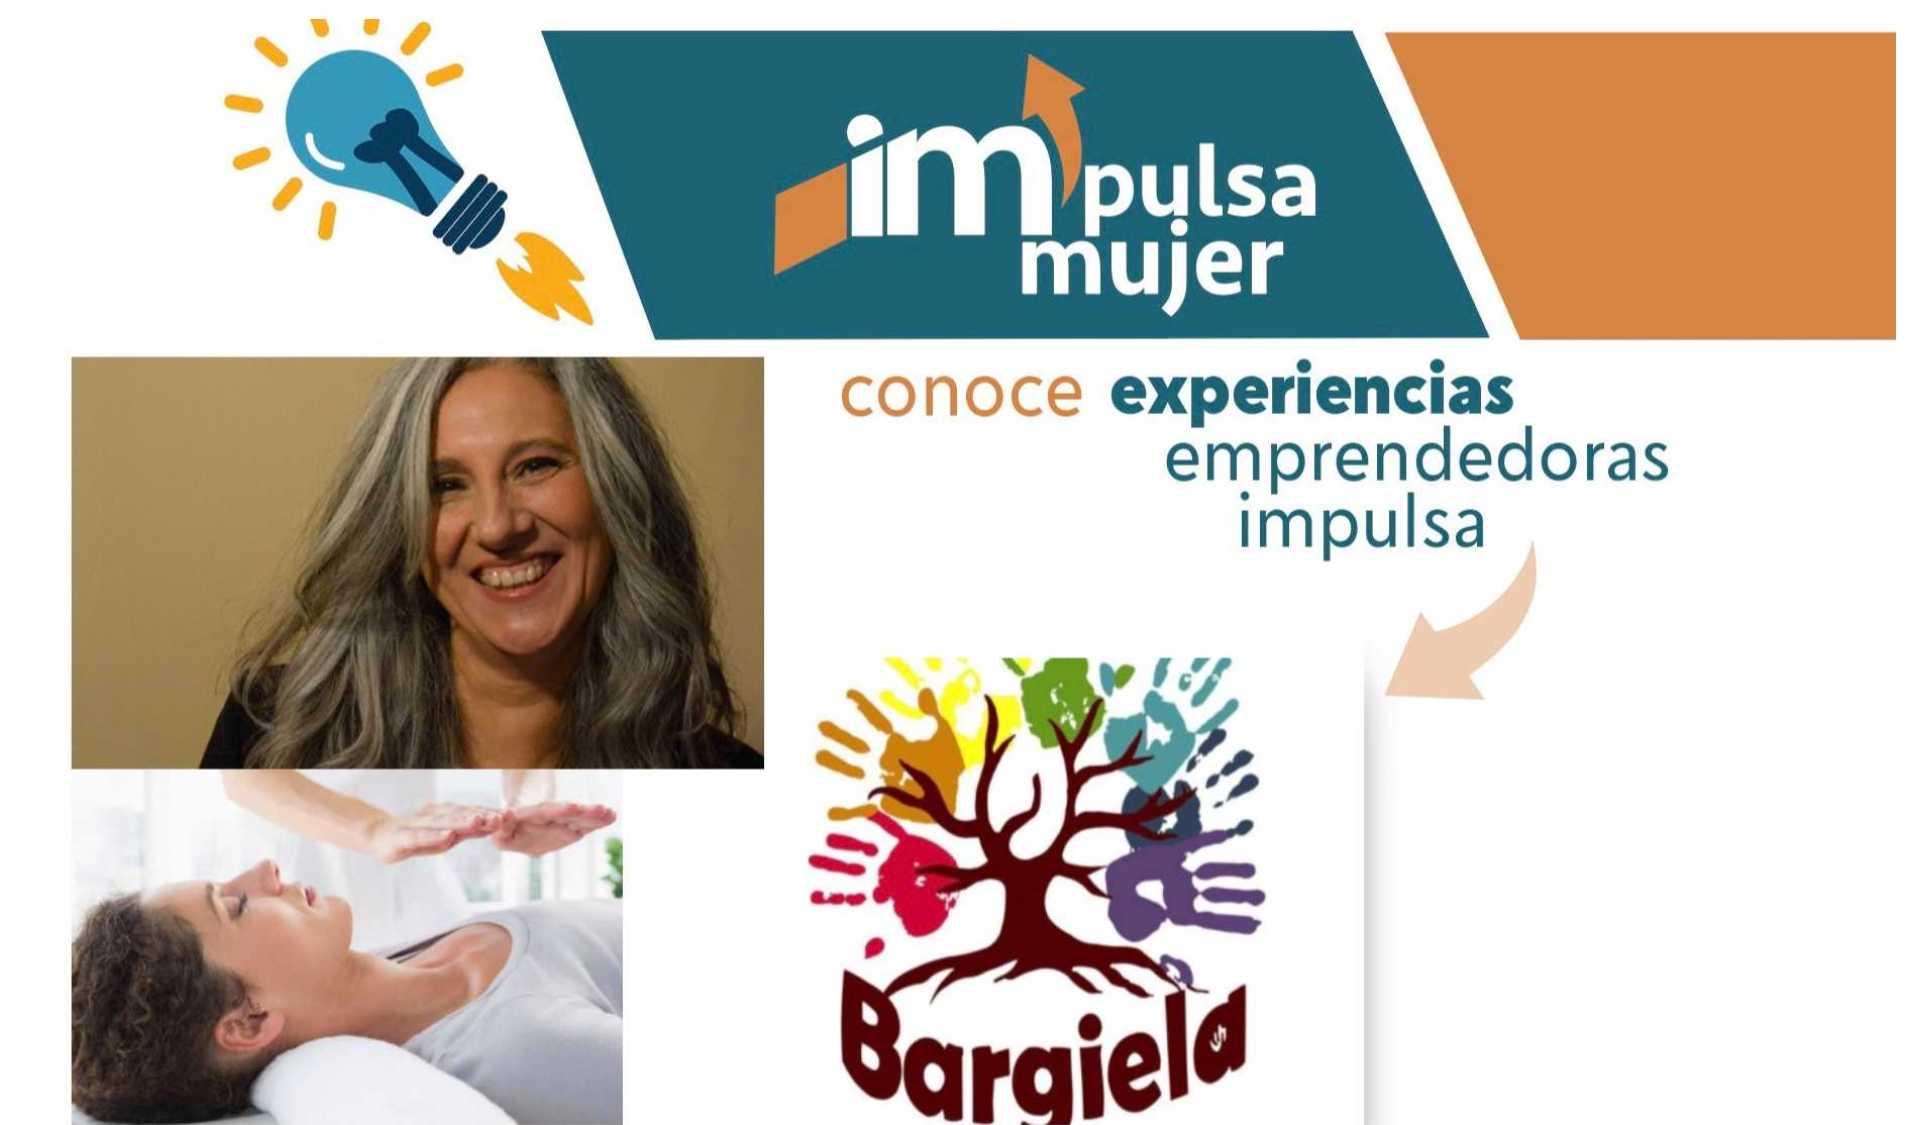 Experiencia emprendedora impulsa Conchi Bargiela, terapeuta floral